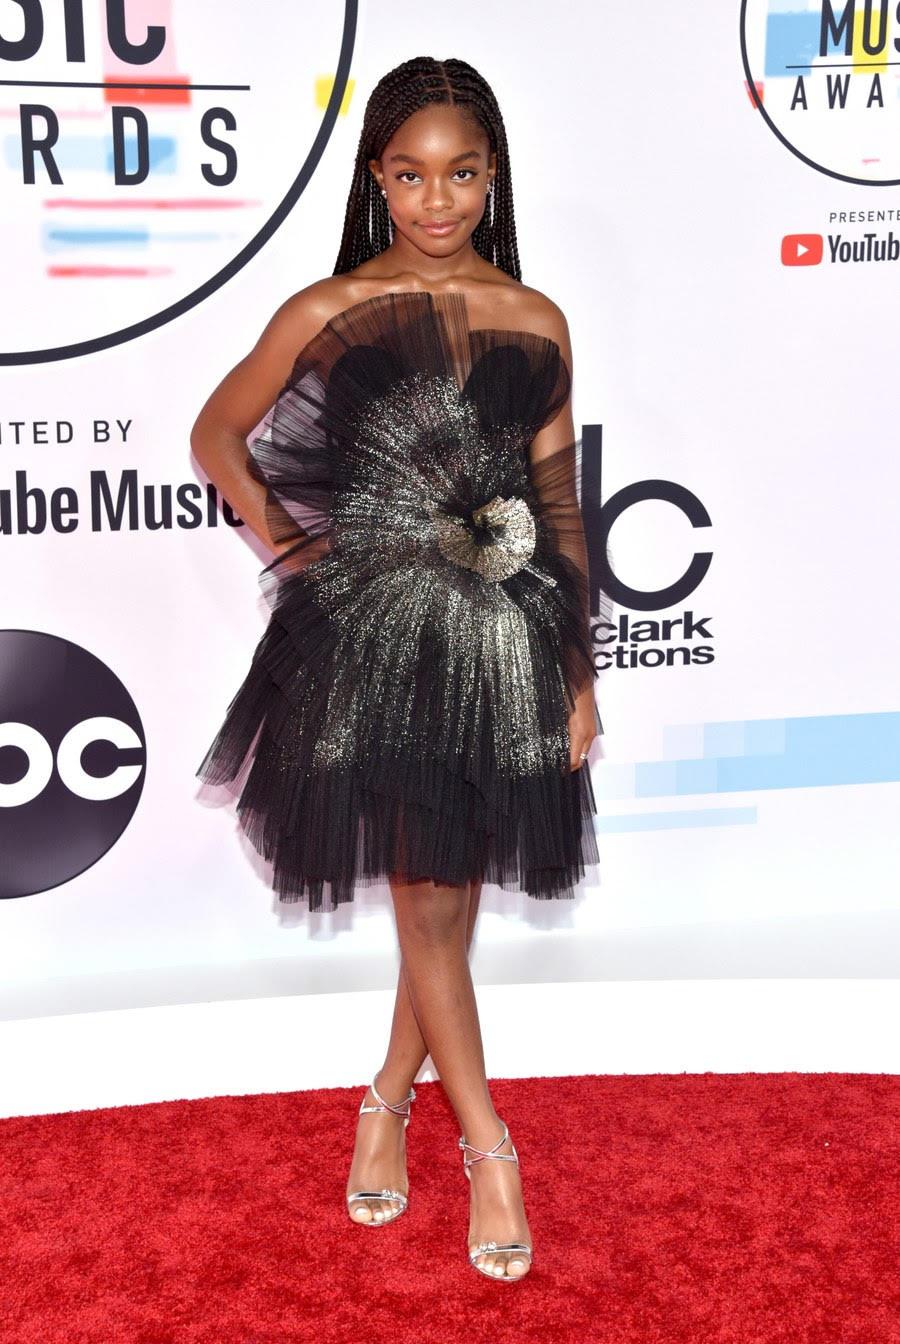 Marsai Martin attends the 2018 American Music Awards